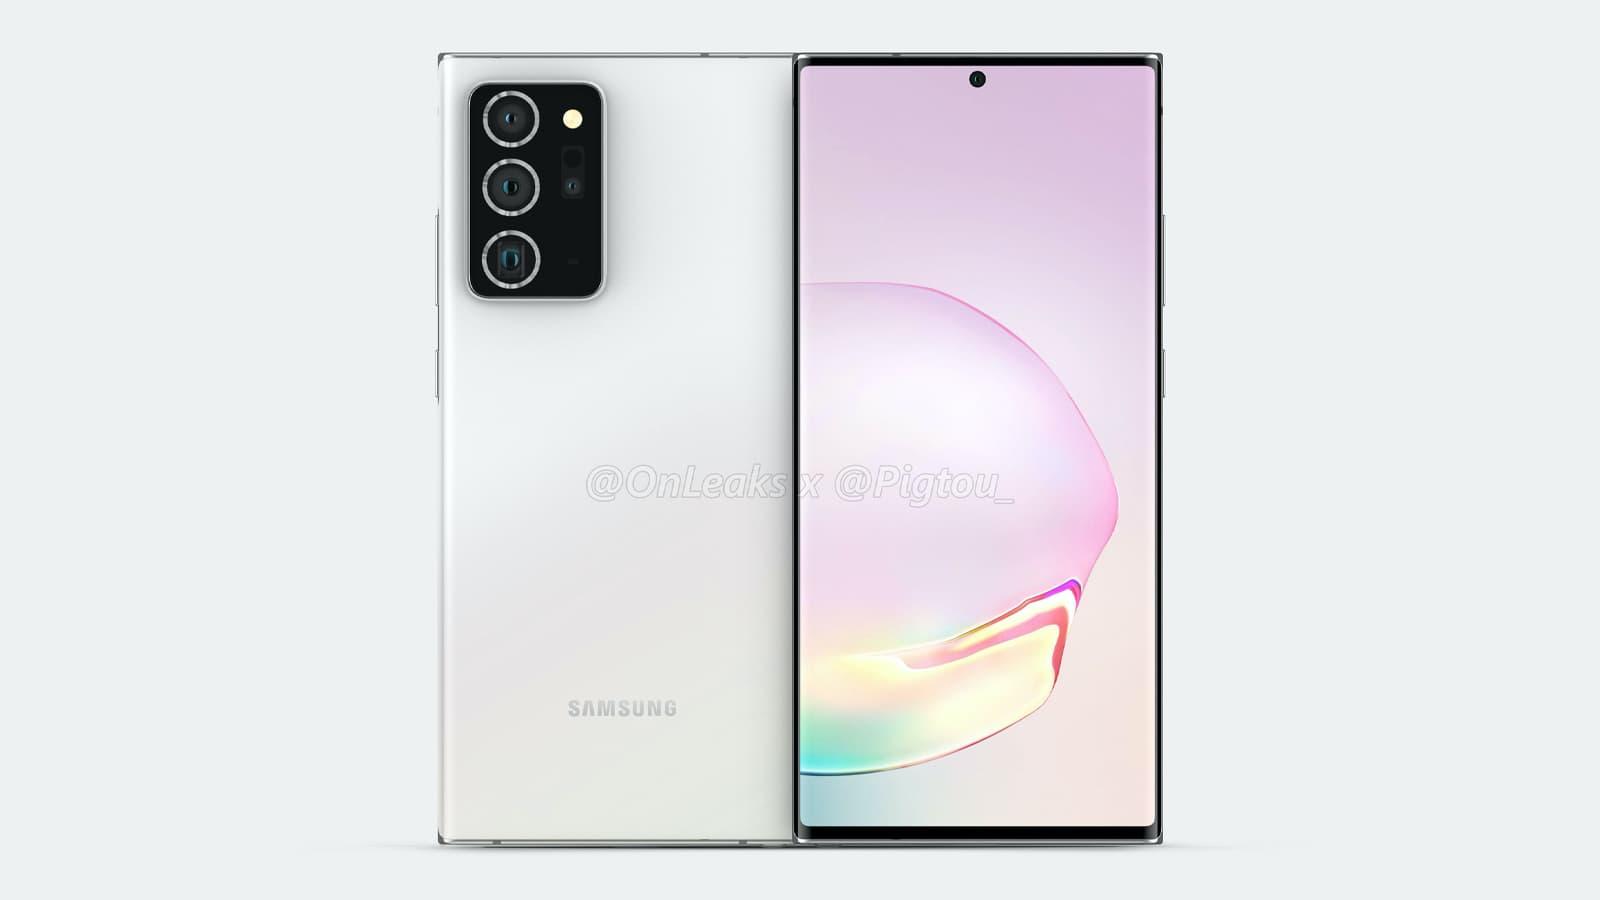 Renderização do possível Galaxy Note 20+